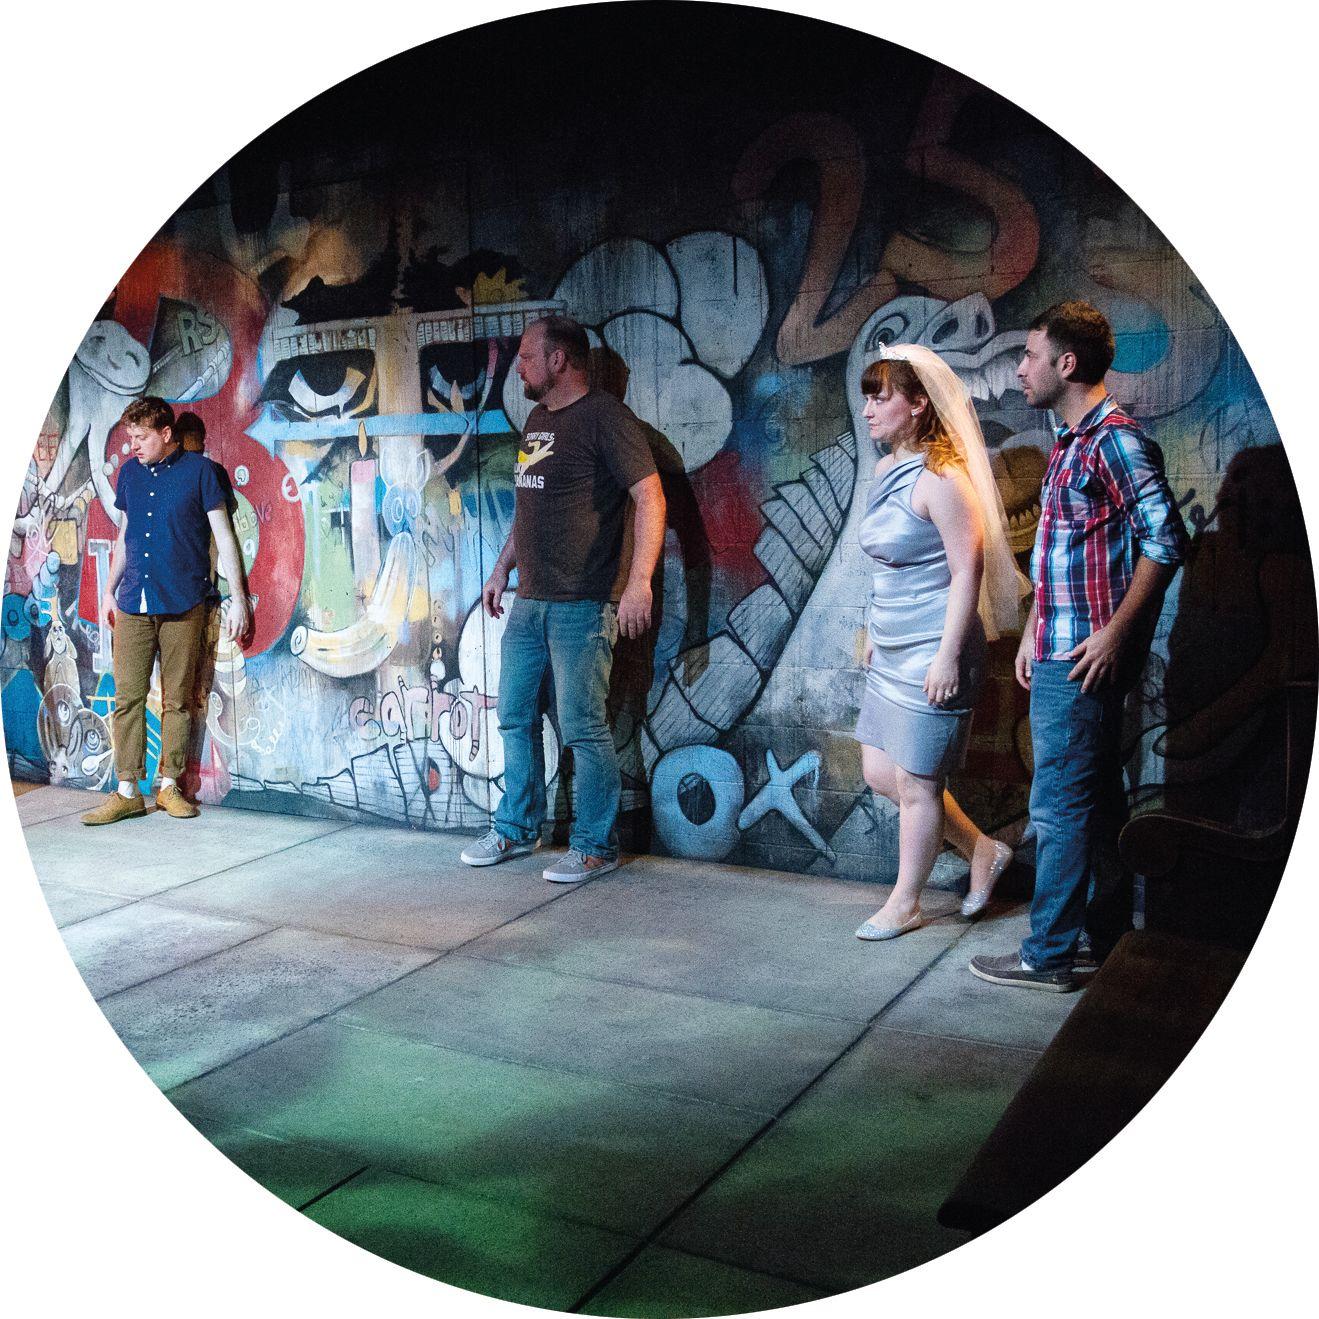 Pomo 0716 botc arts shoebox theater tyom8e